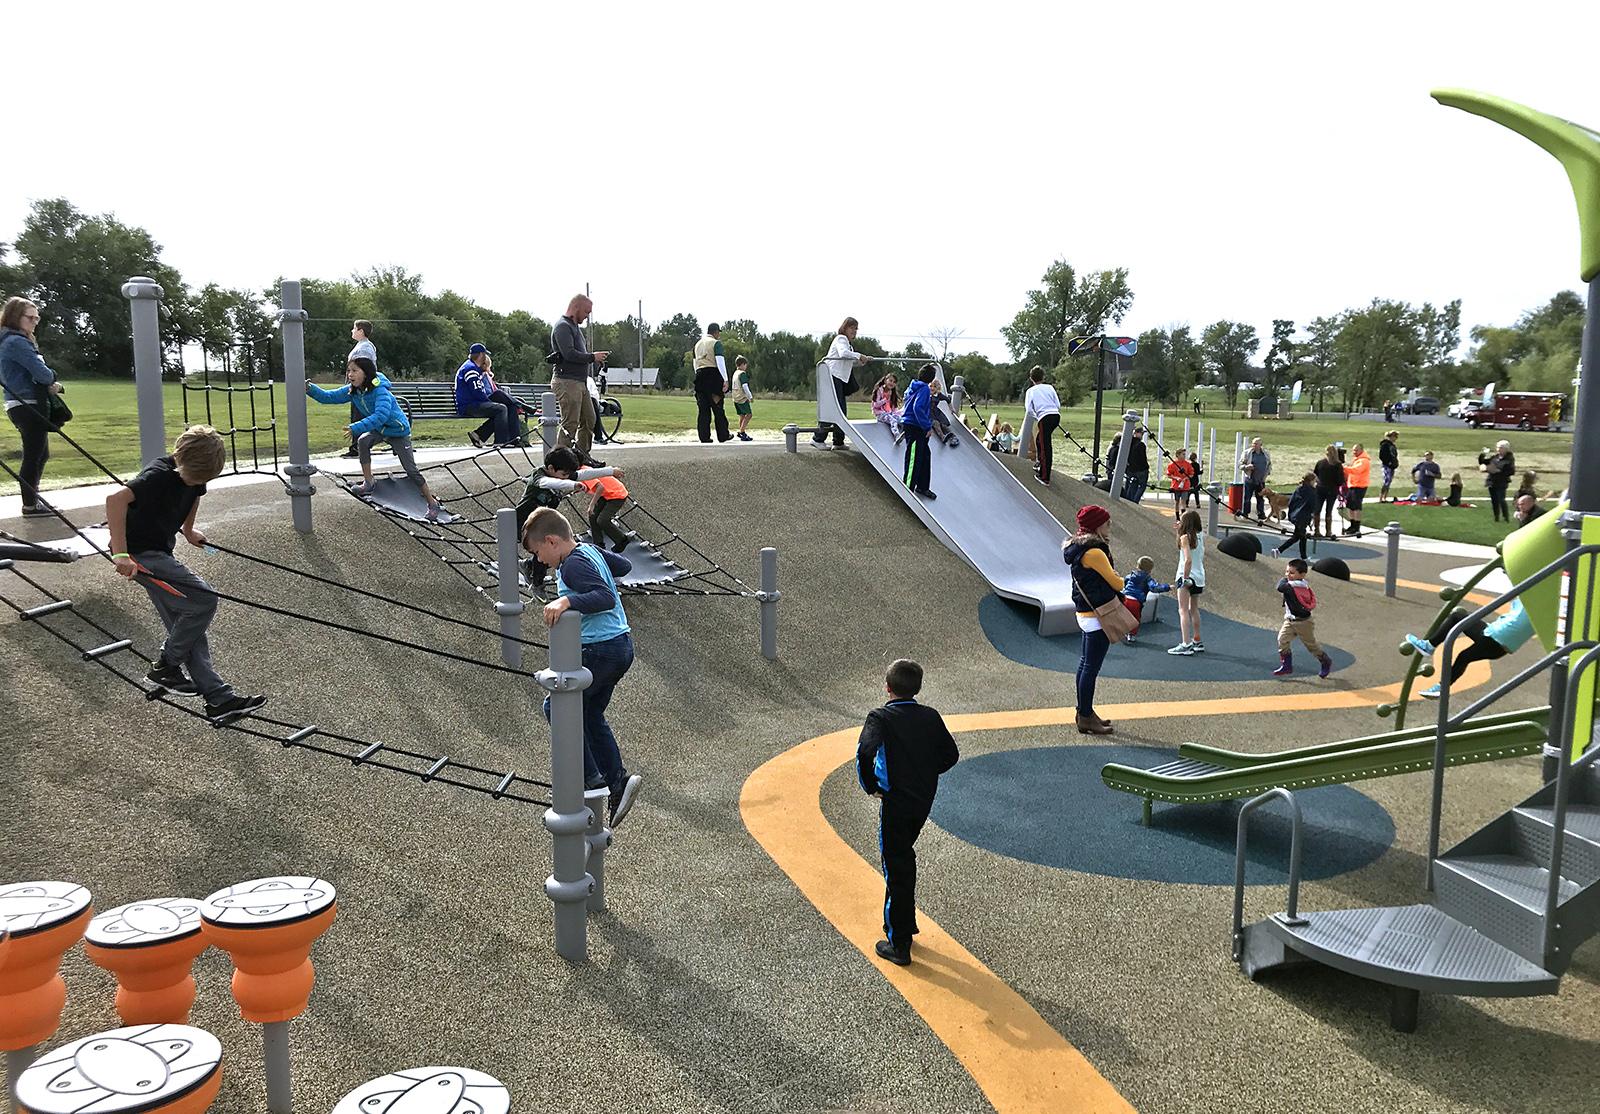 JCPRD Playground9.jpg